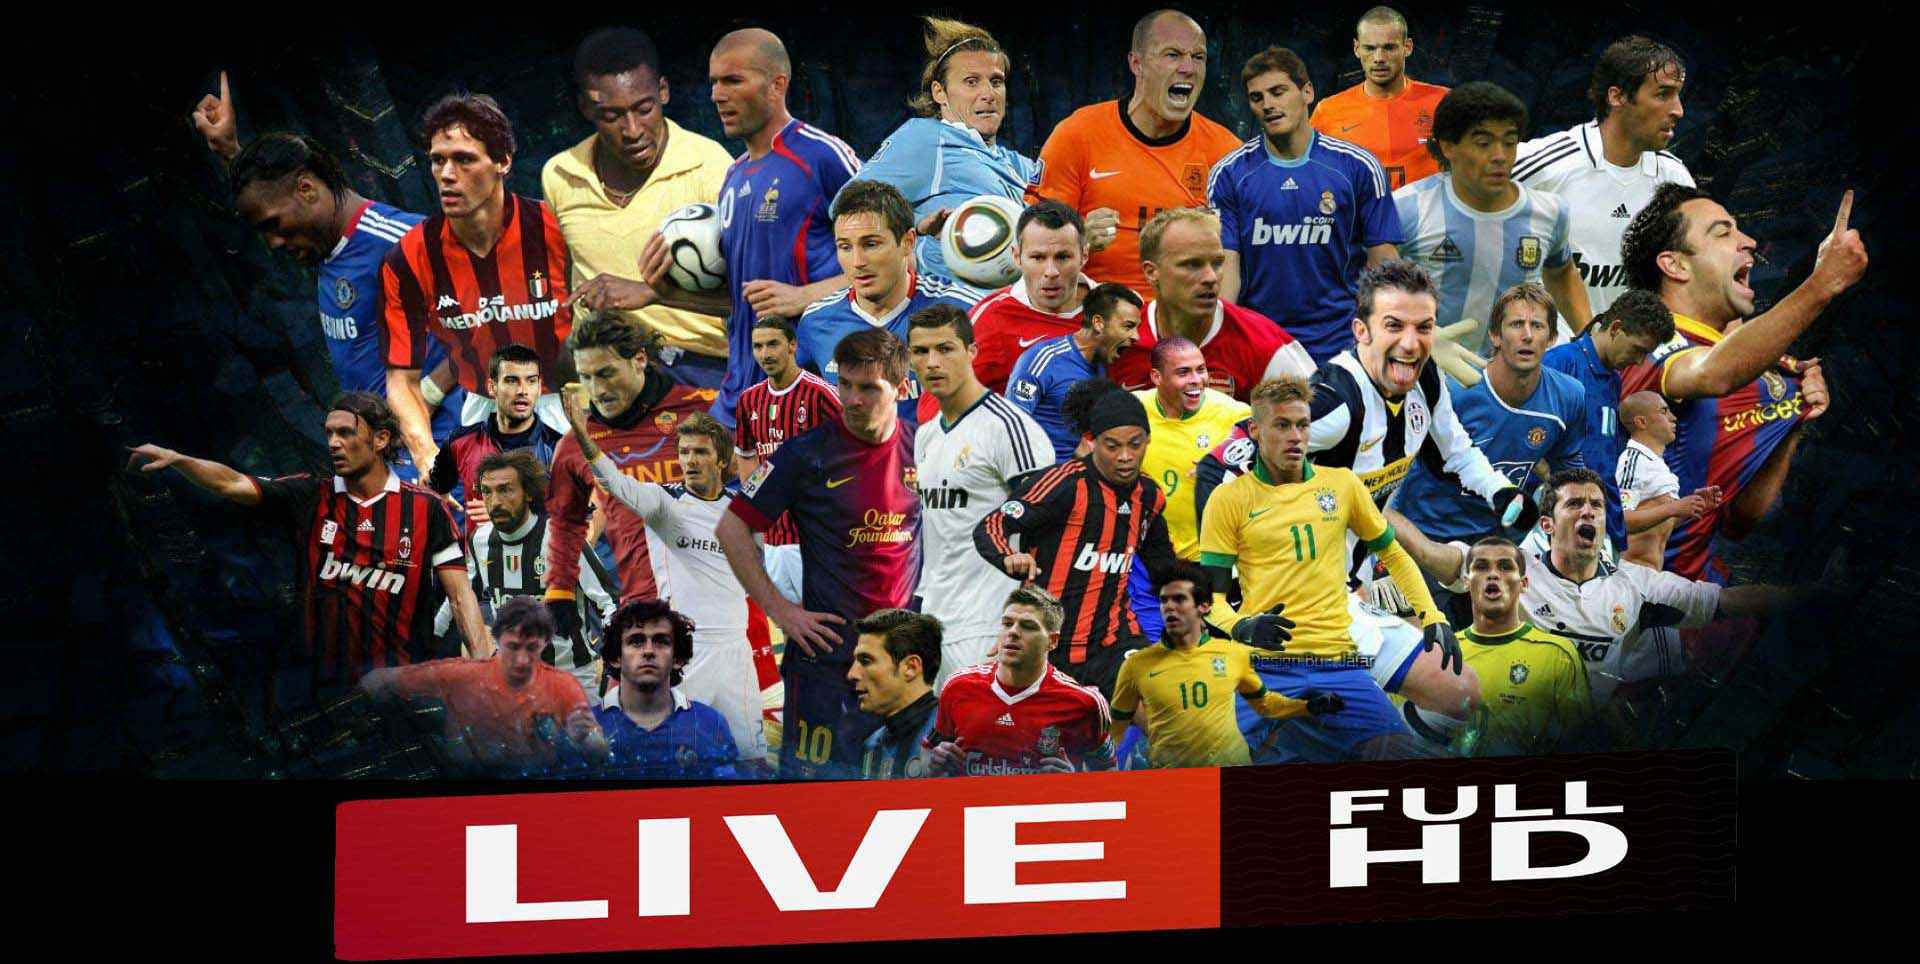 Monaco vs Manchester City live